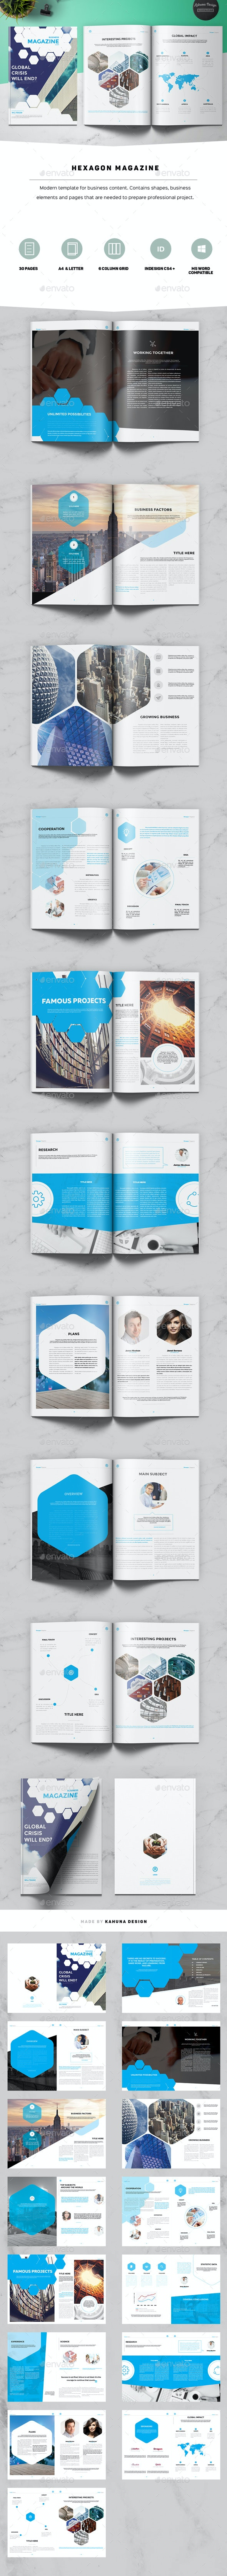 Hexagon Business Magazine - Magazines Print Templates